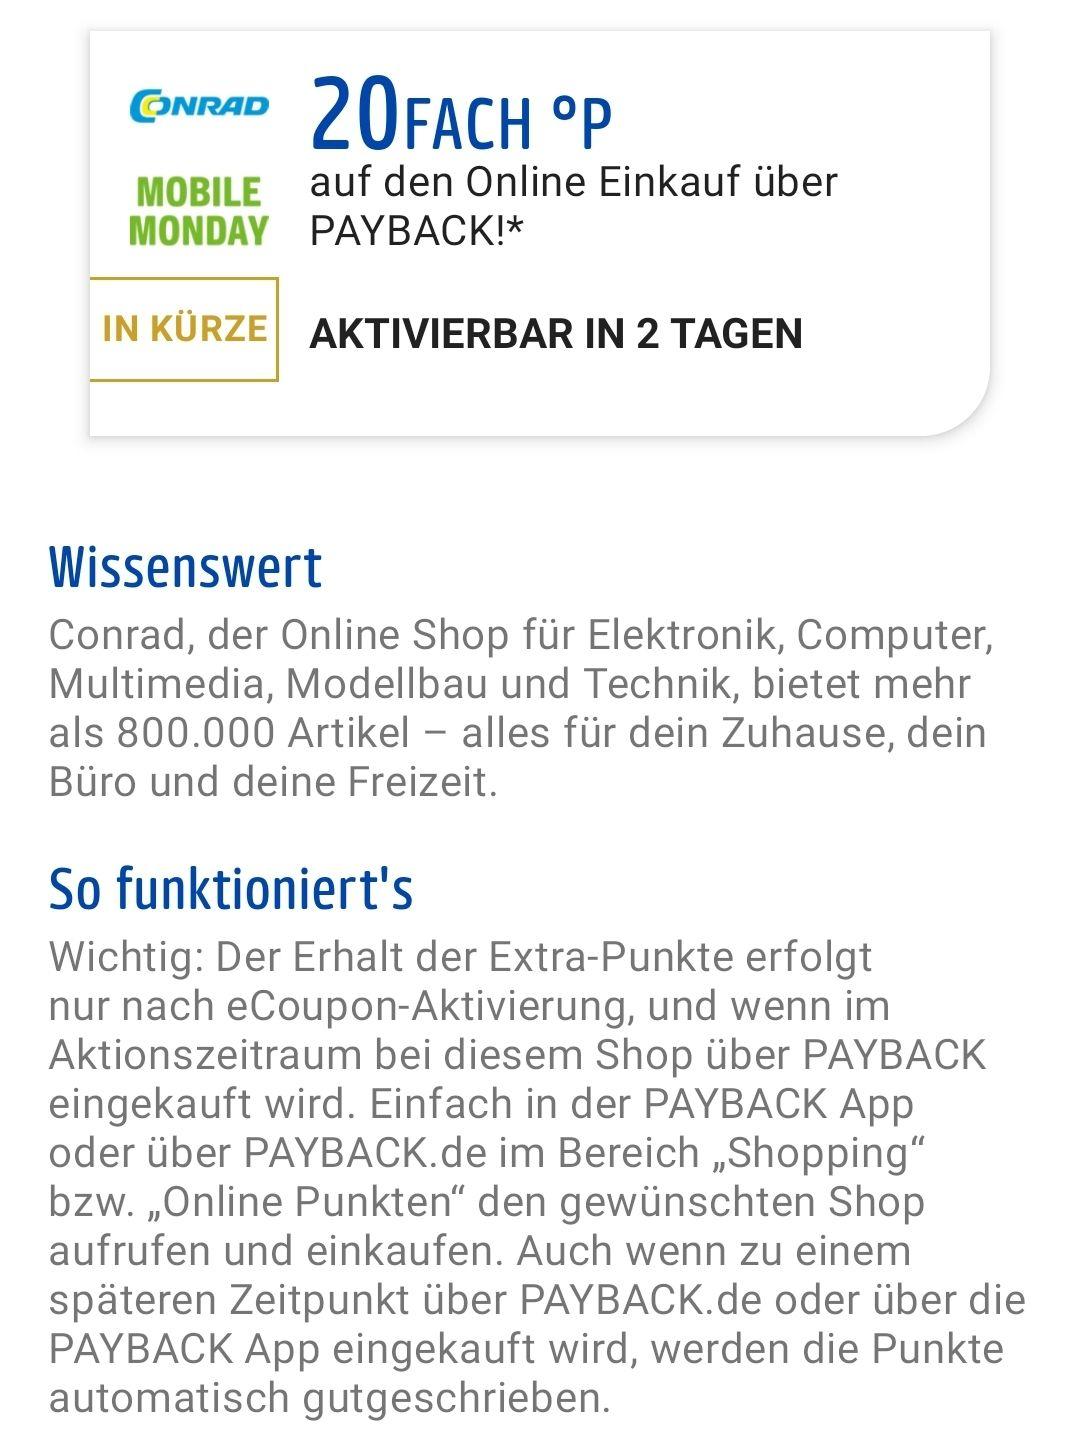 Payback Mobile Monday (Conrad) 20-fach Punkte - entspricht 10% cashback!